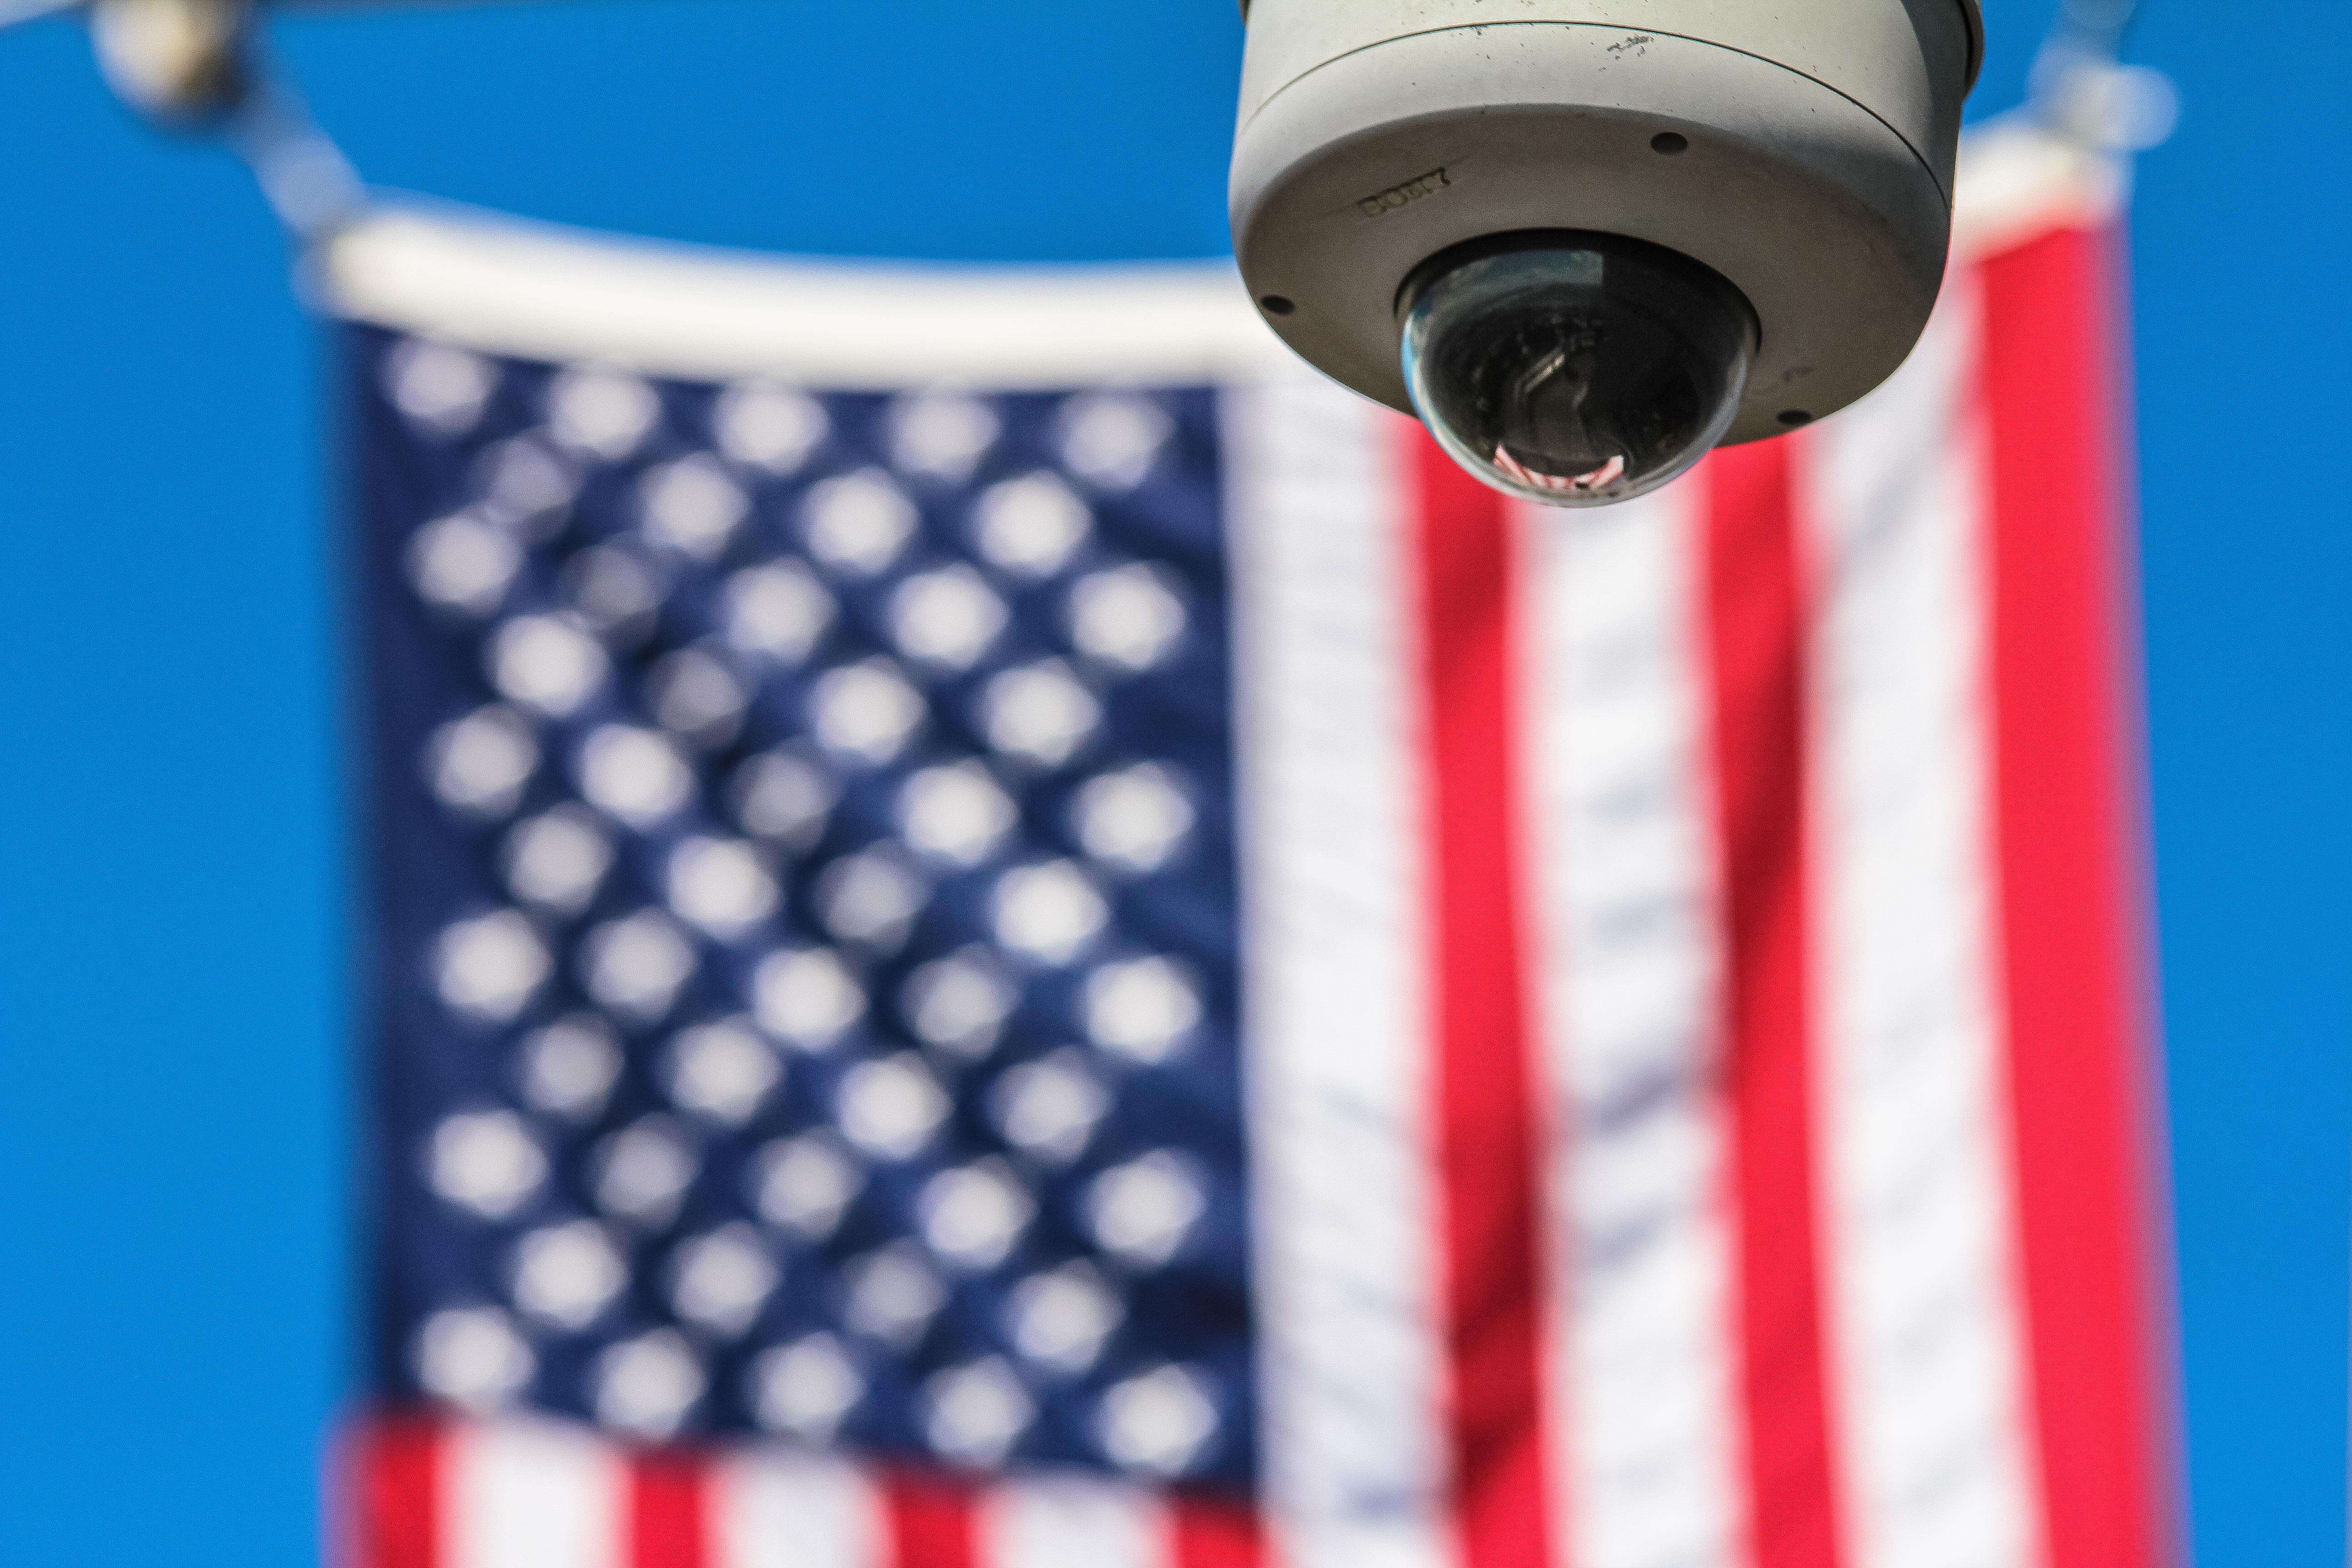 Spy Law Image